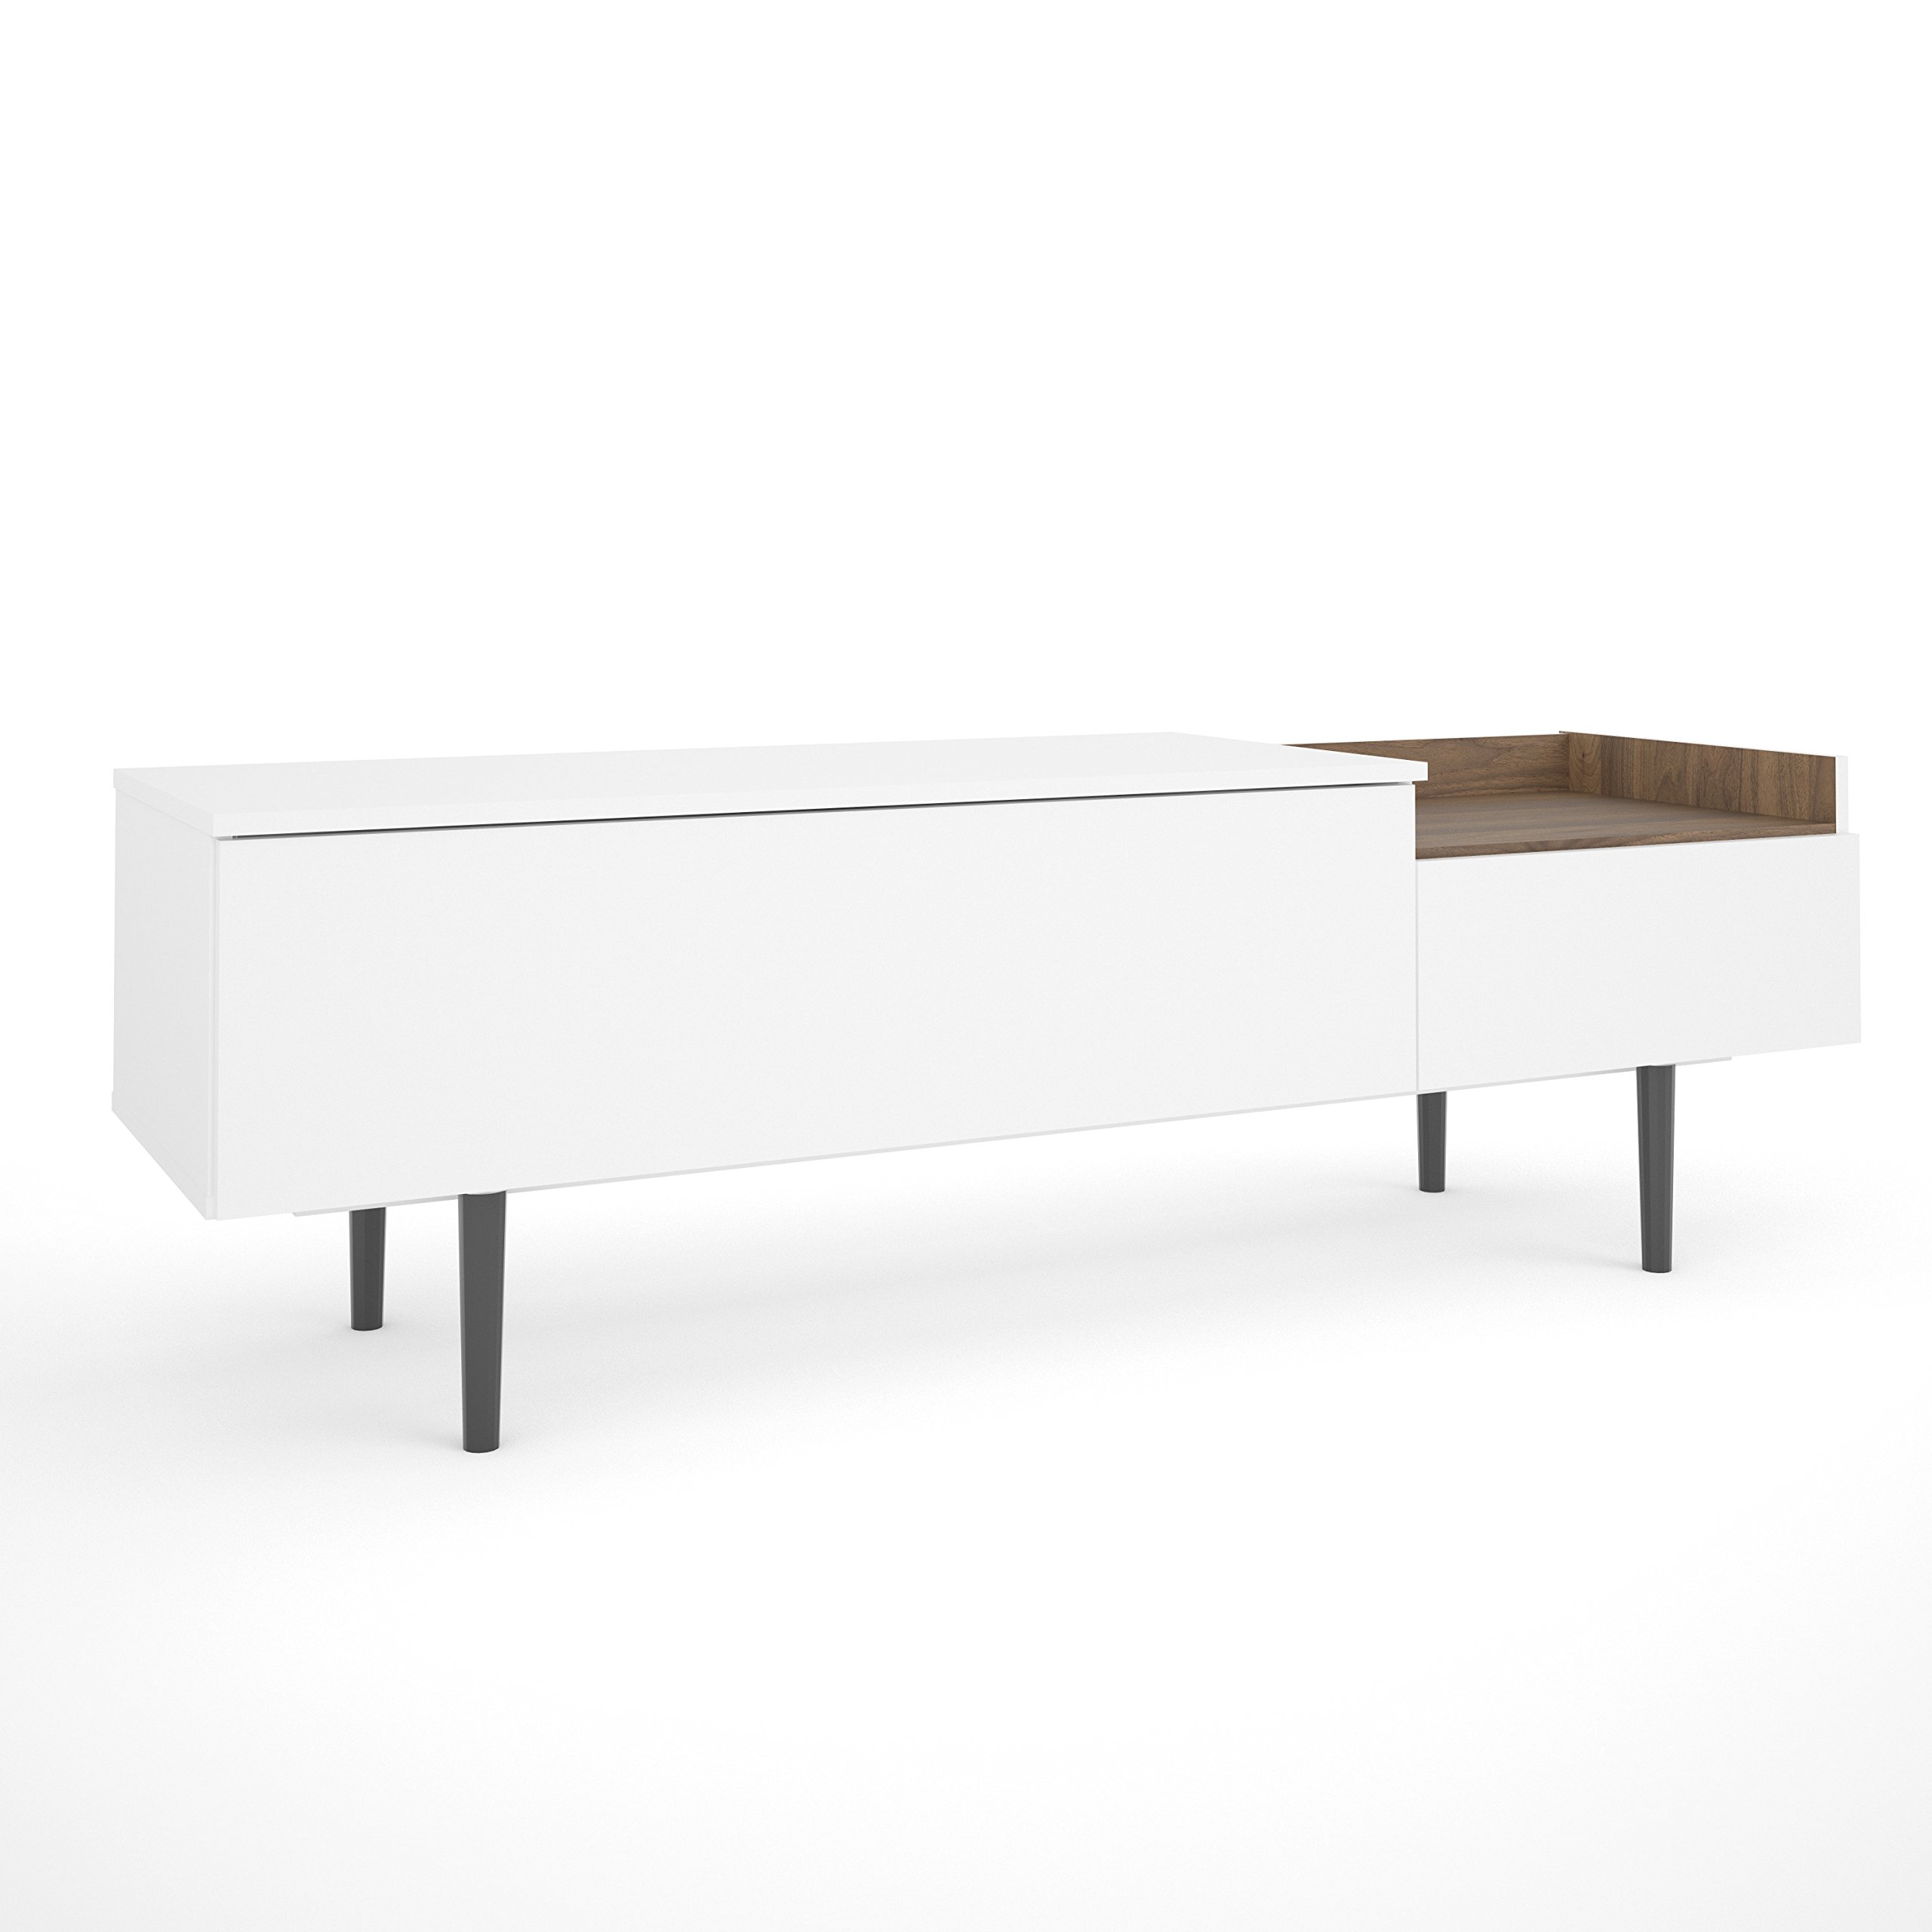 Tvilum 9214849dj Unit 2 Drawer Sideboard, White/Walnut